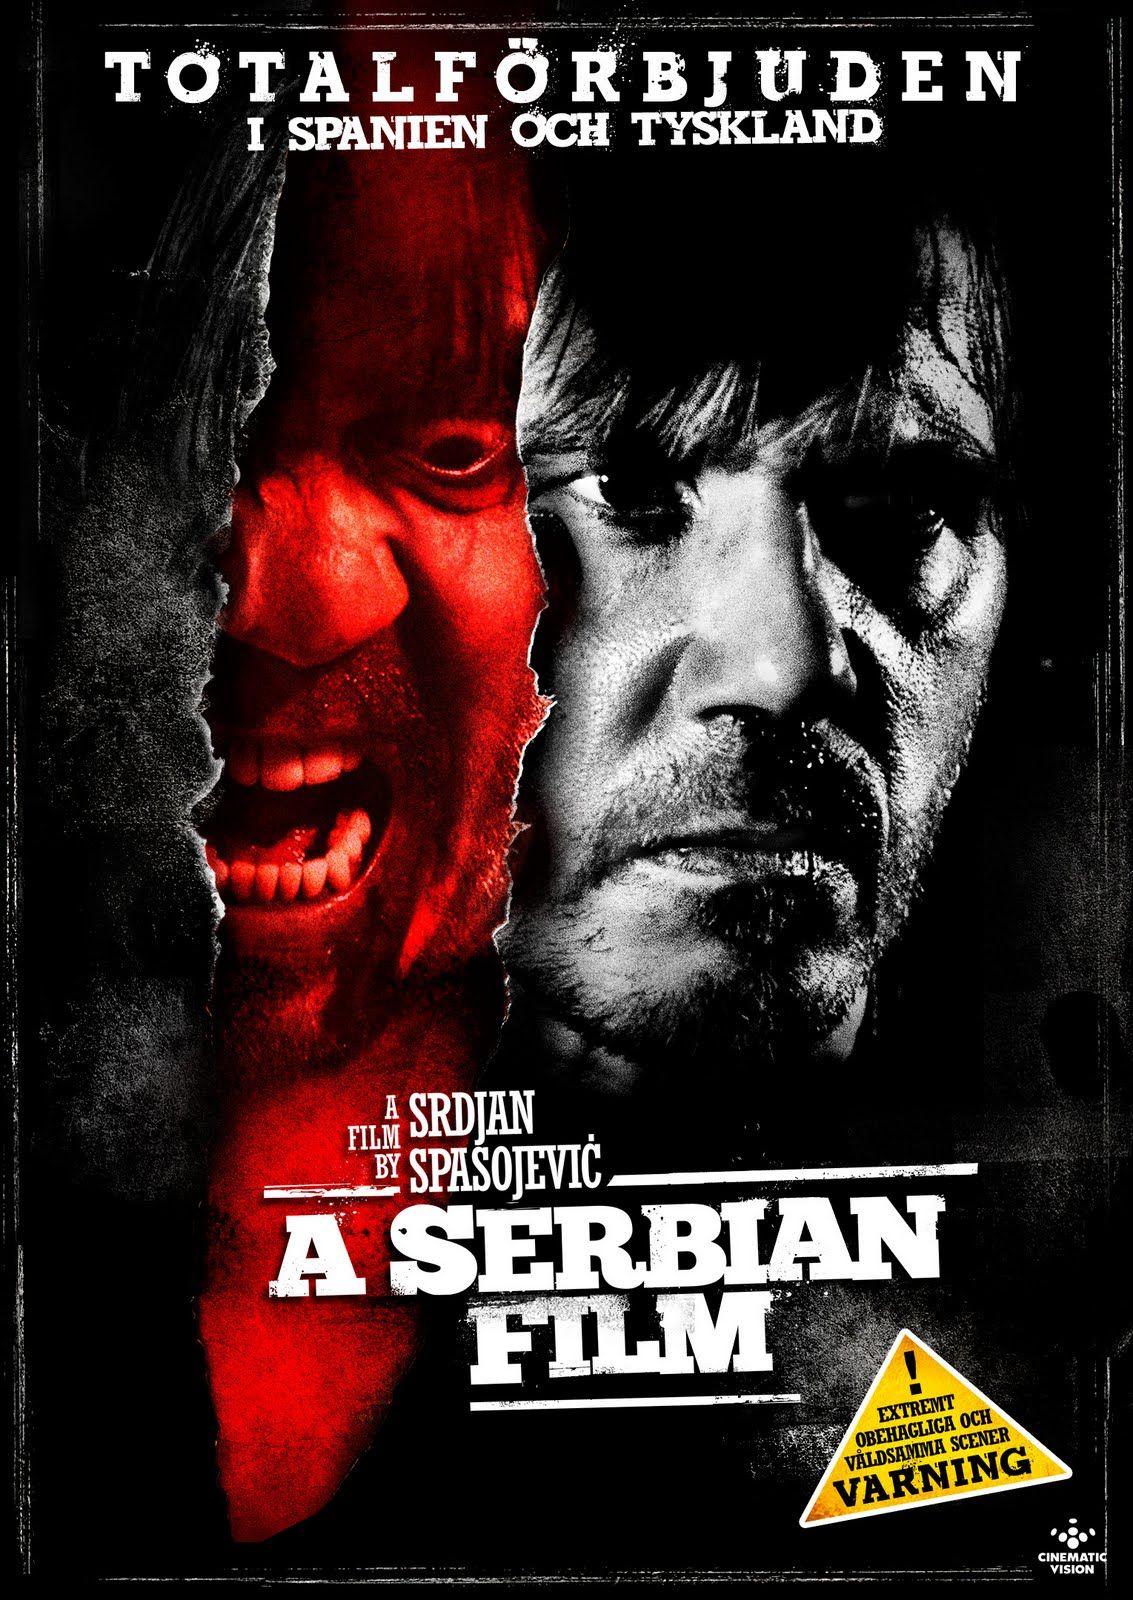 A Serbian Film Porno a serbian film (2010) - srdjan spasojevic — rotten pop